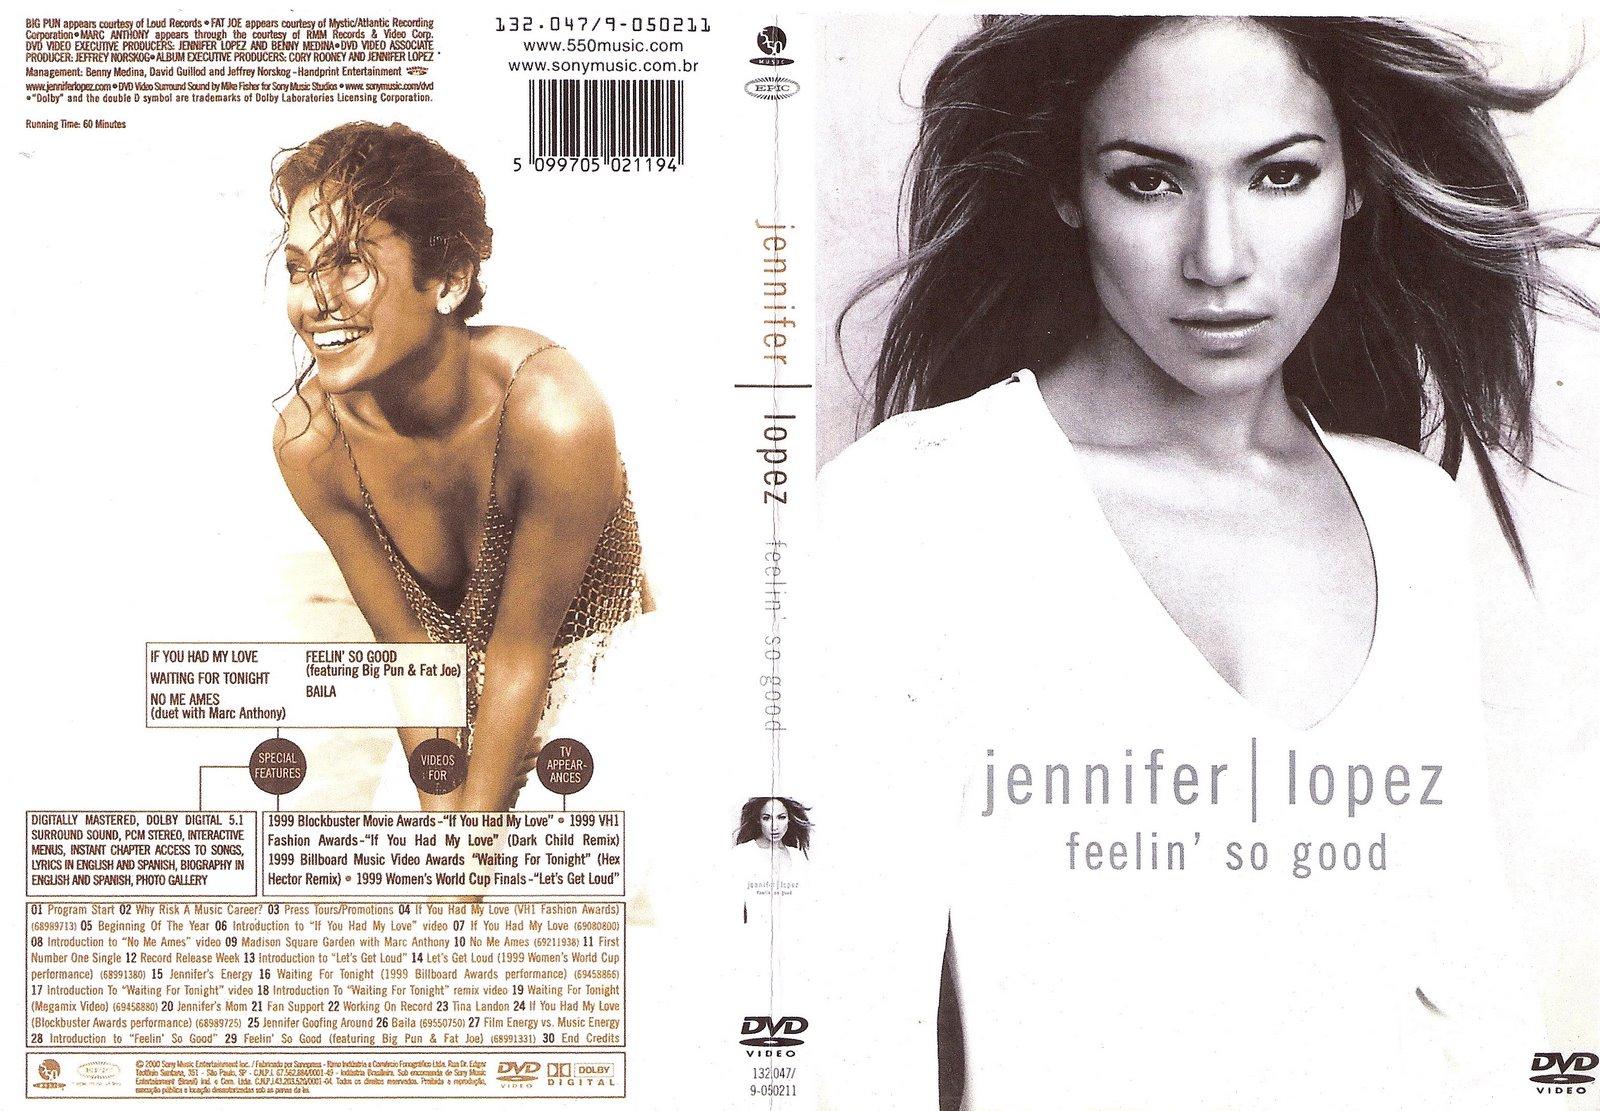 http://3.bp.blogspot.com/_brcl7Spzbn4/TJDTFVeTBAI/AAAAAAAAAk8/lfREjw3WmQw/s1600/Jennifer+Lopes+-+Feelin%27+So+Good.jpg